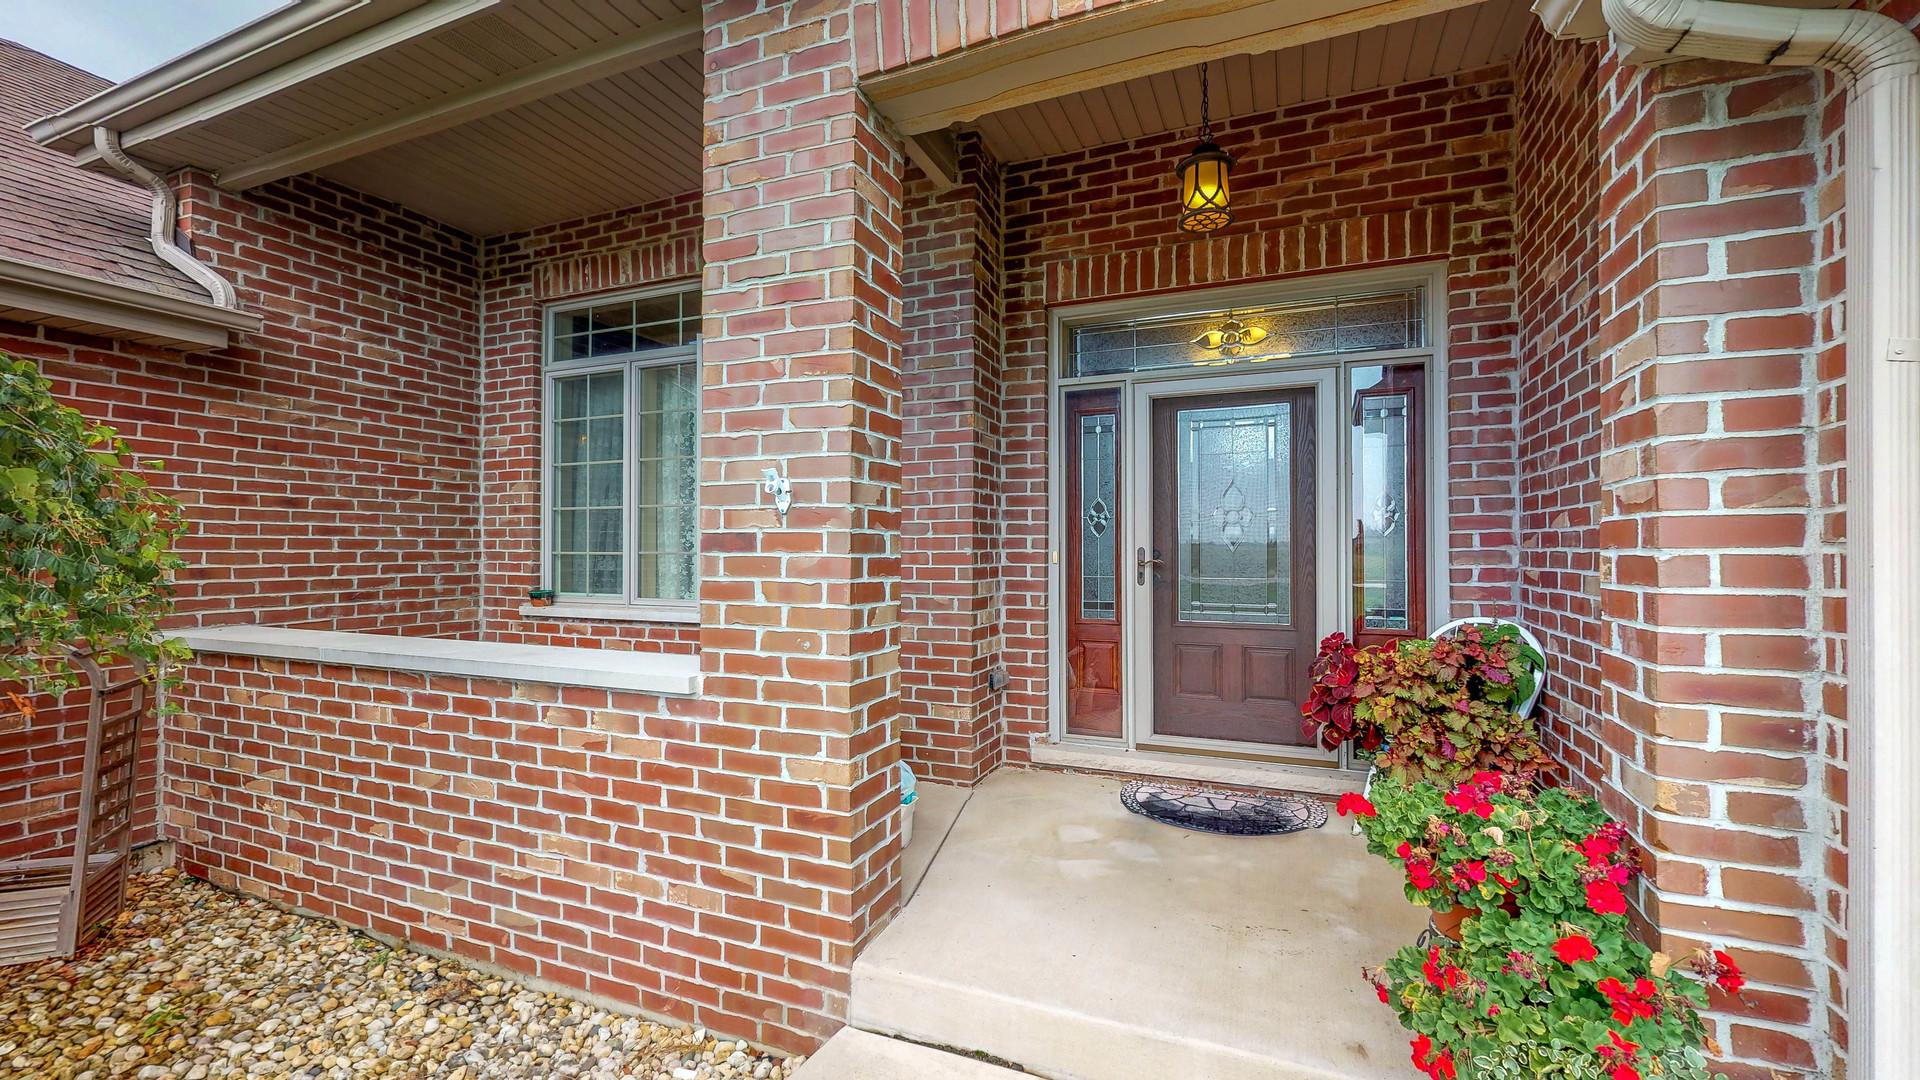 6912 Trisha, Monee, Illinois, 60449